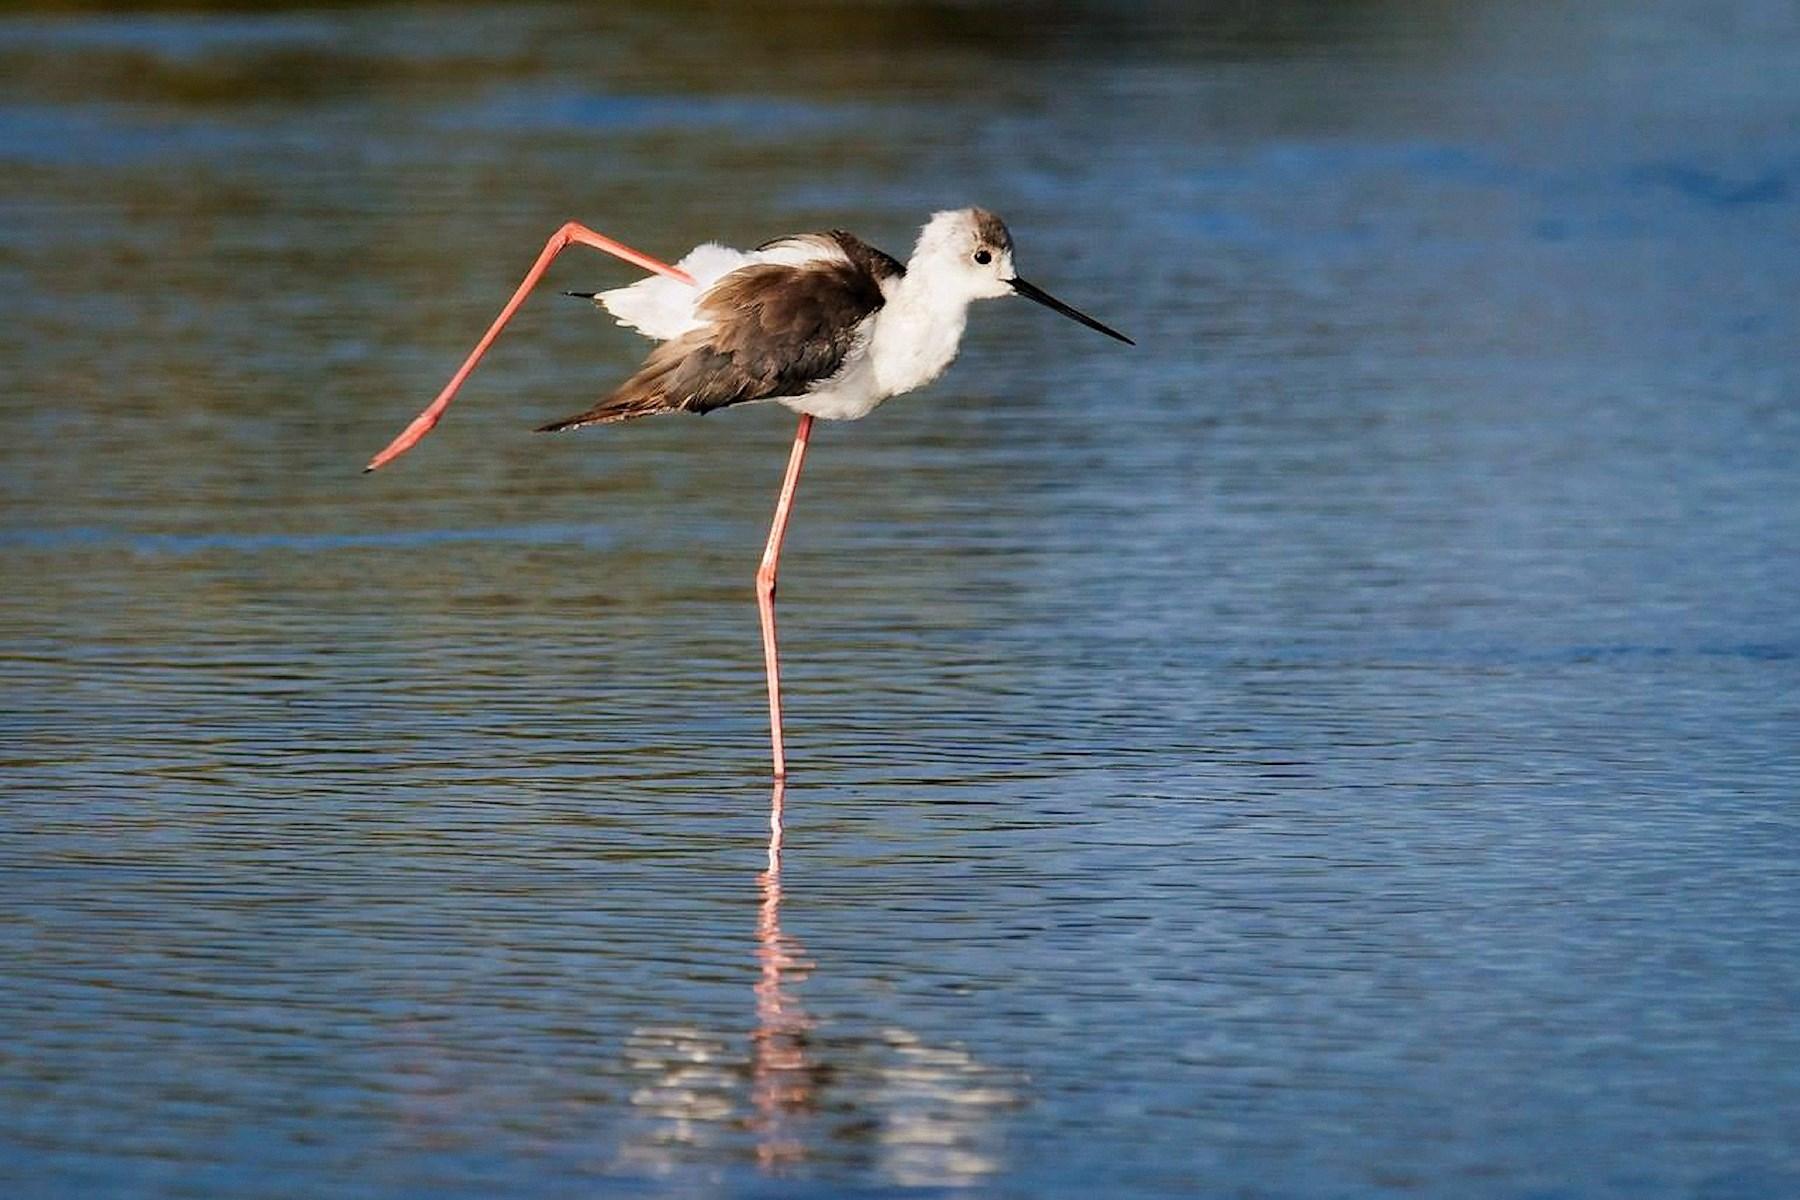 00 Kirill Trubitsyn. The Dancer. Black-Winged Stilt. Serengetti National Park Tanzania. 2015